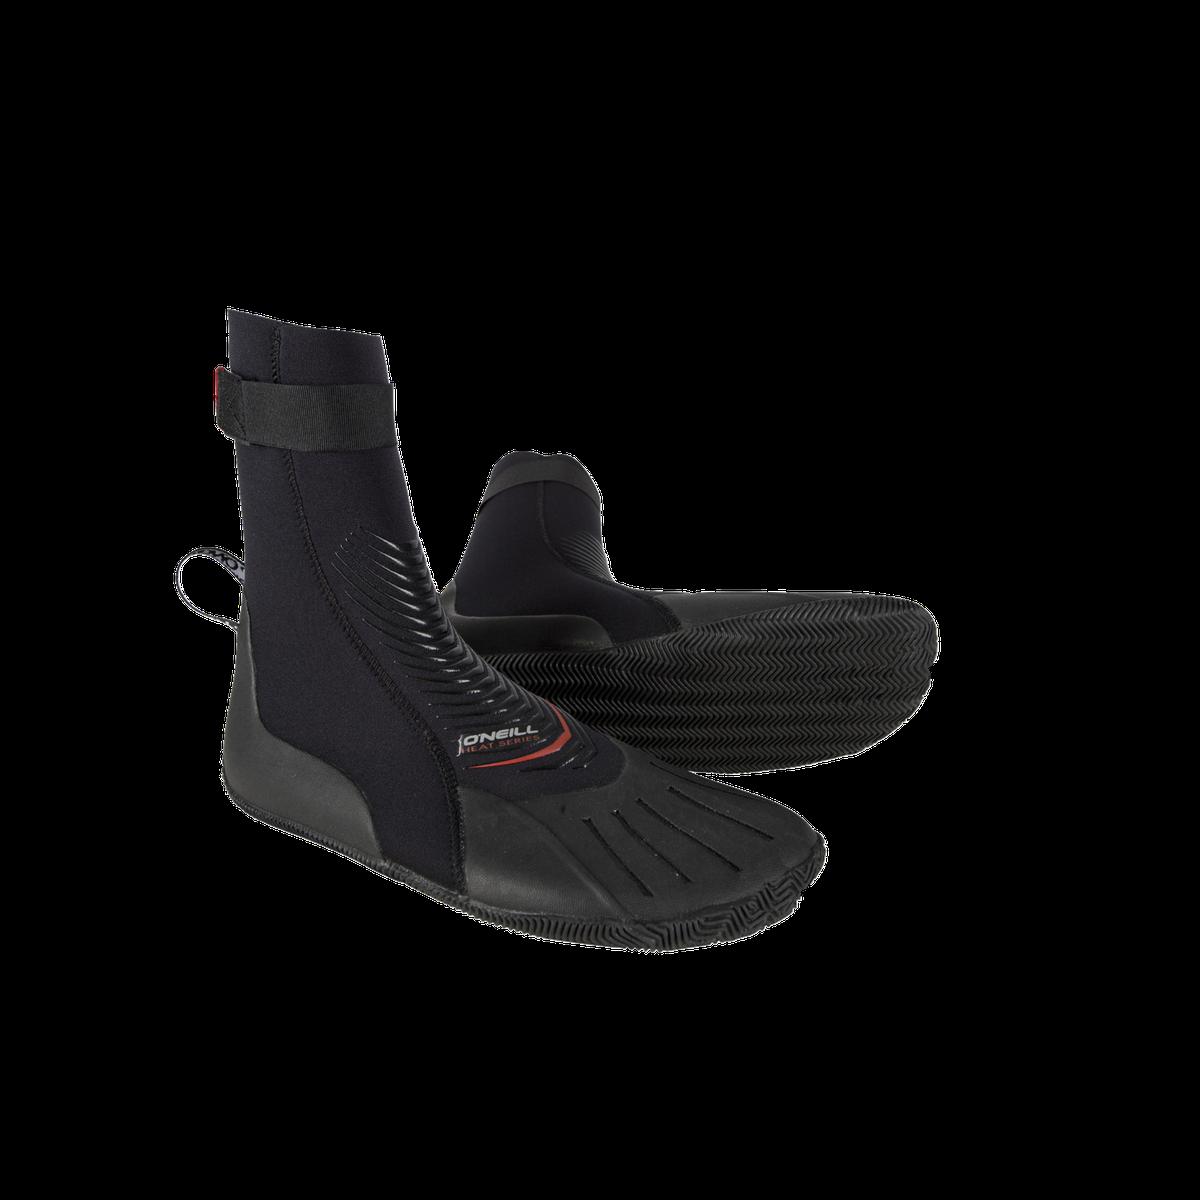 O Neill Heat 3mm Rt Boot eb41446100